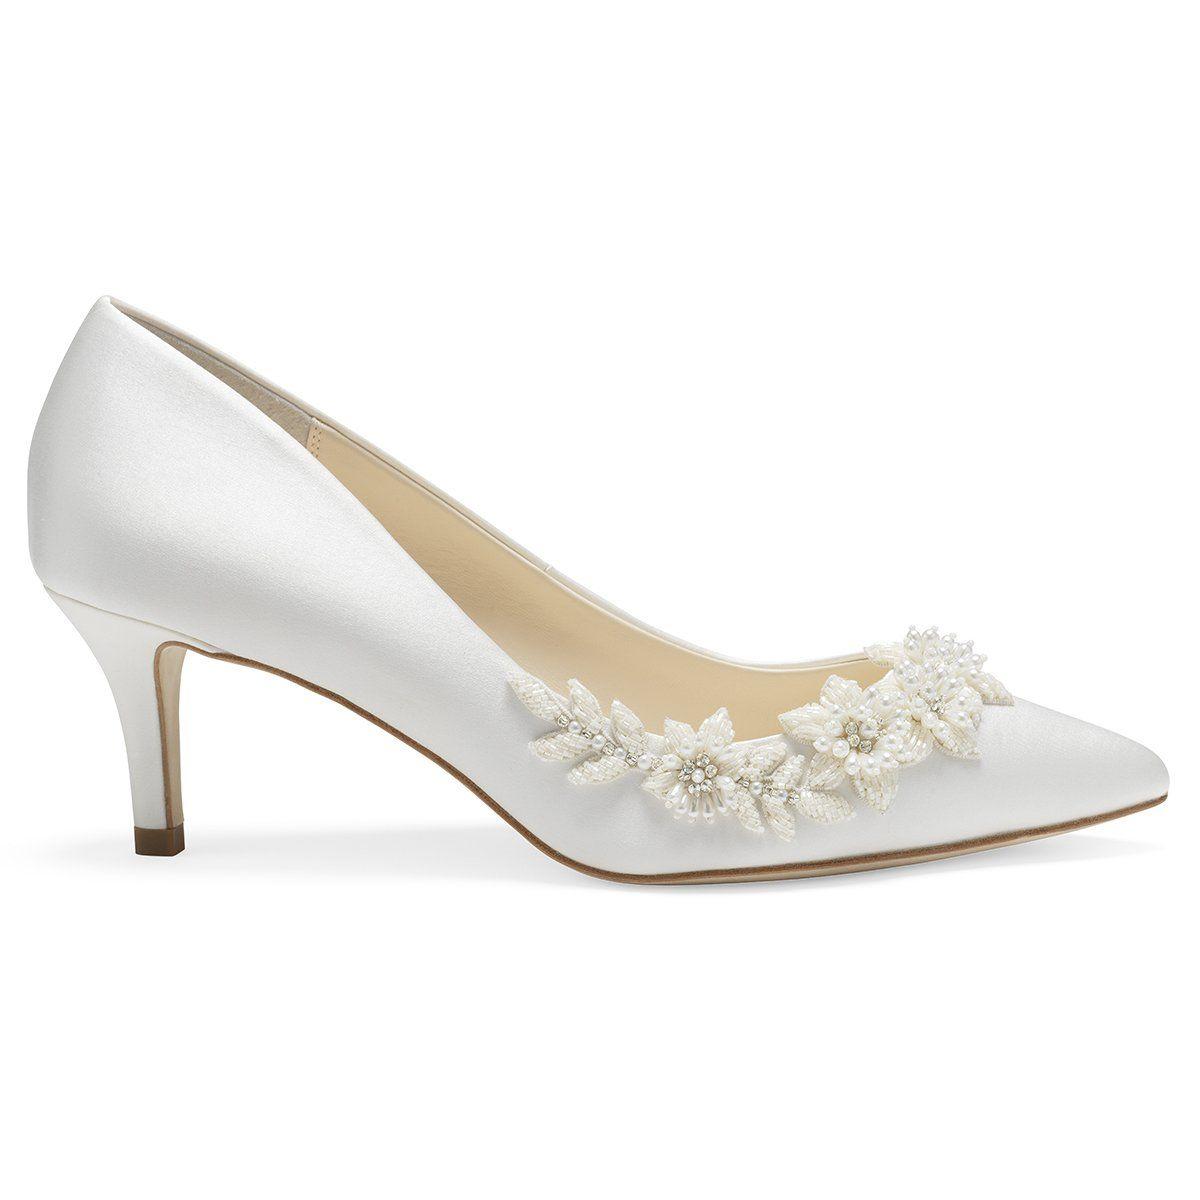 3d Floral Pearls And Beads Ivory Kitten Heels In 2020 Kitten Heels Wedding Bridal Shoes Low Heel Kitten Heel Wedding Shoes